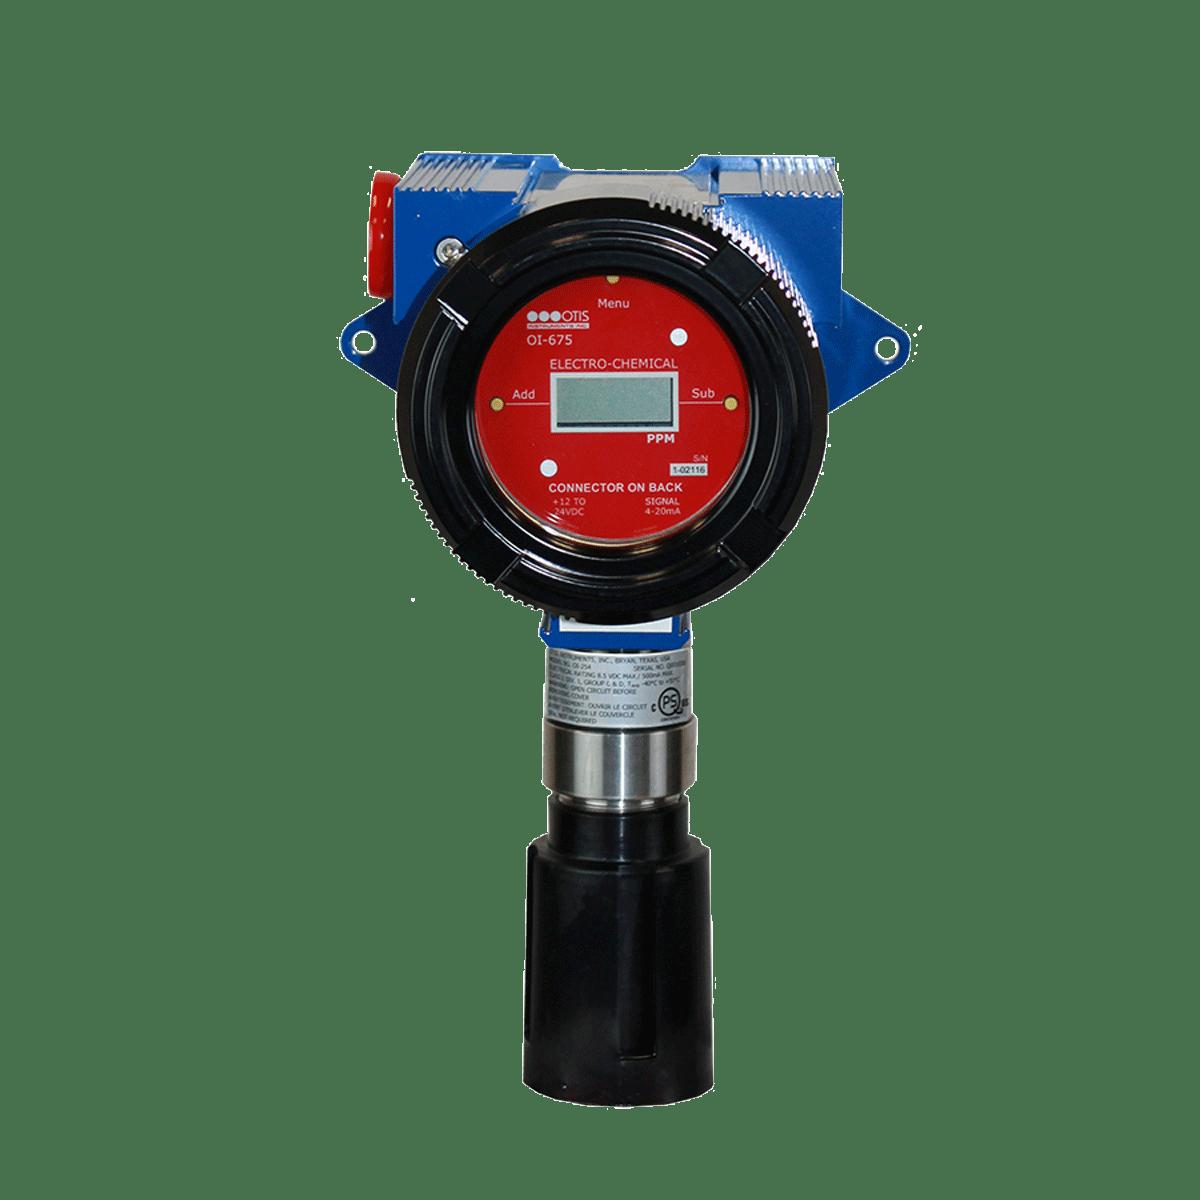 OI-675-Sensor-Assembly-(Front-View-2)---Otis-Instruments